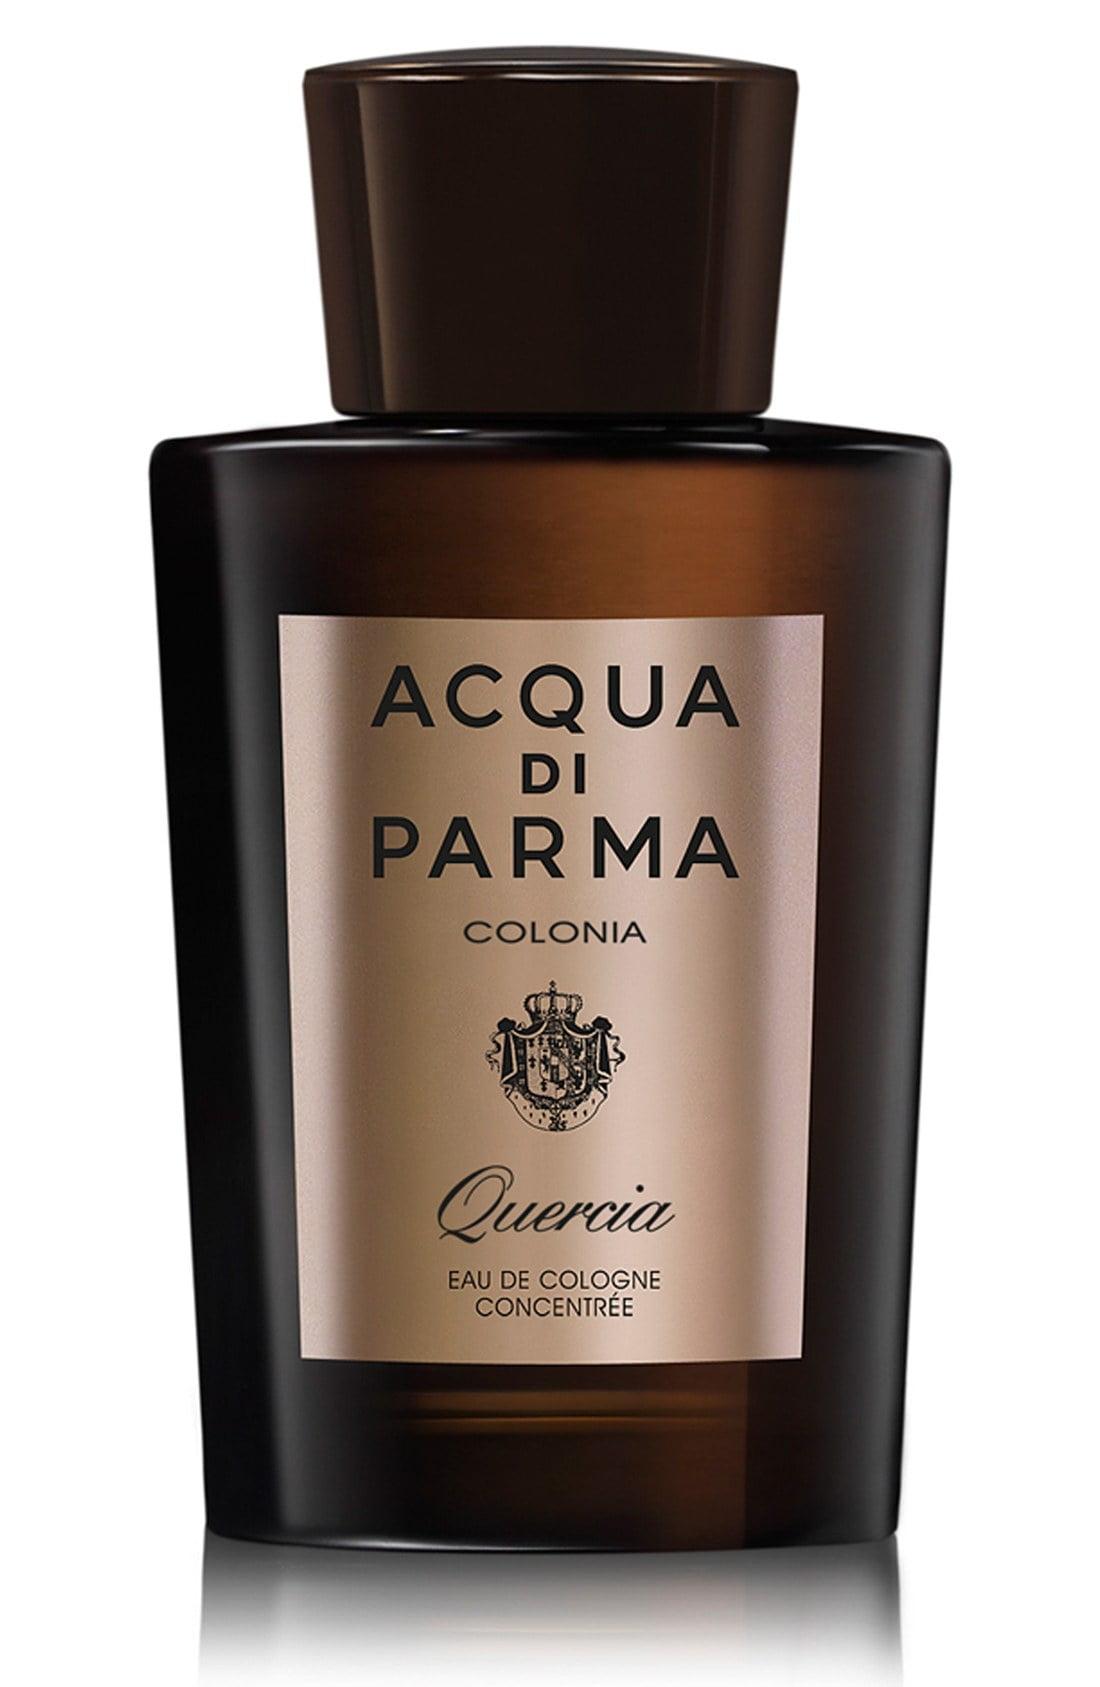 Acqua Di Parma - Colonia Quercia Eau de Cologne Concentree Natural Spray (180ml)